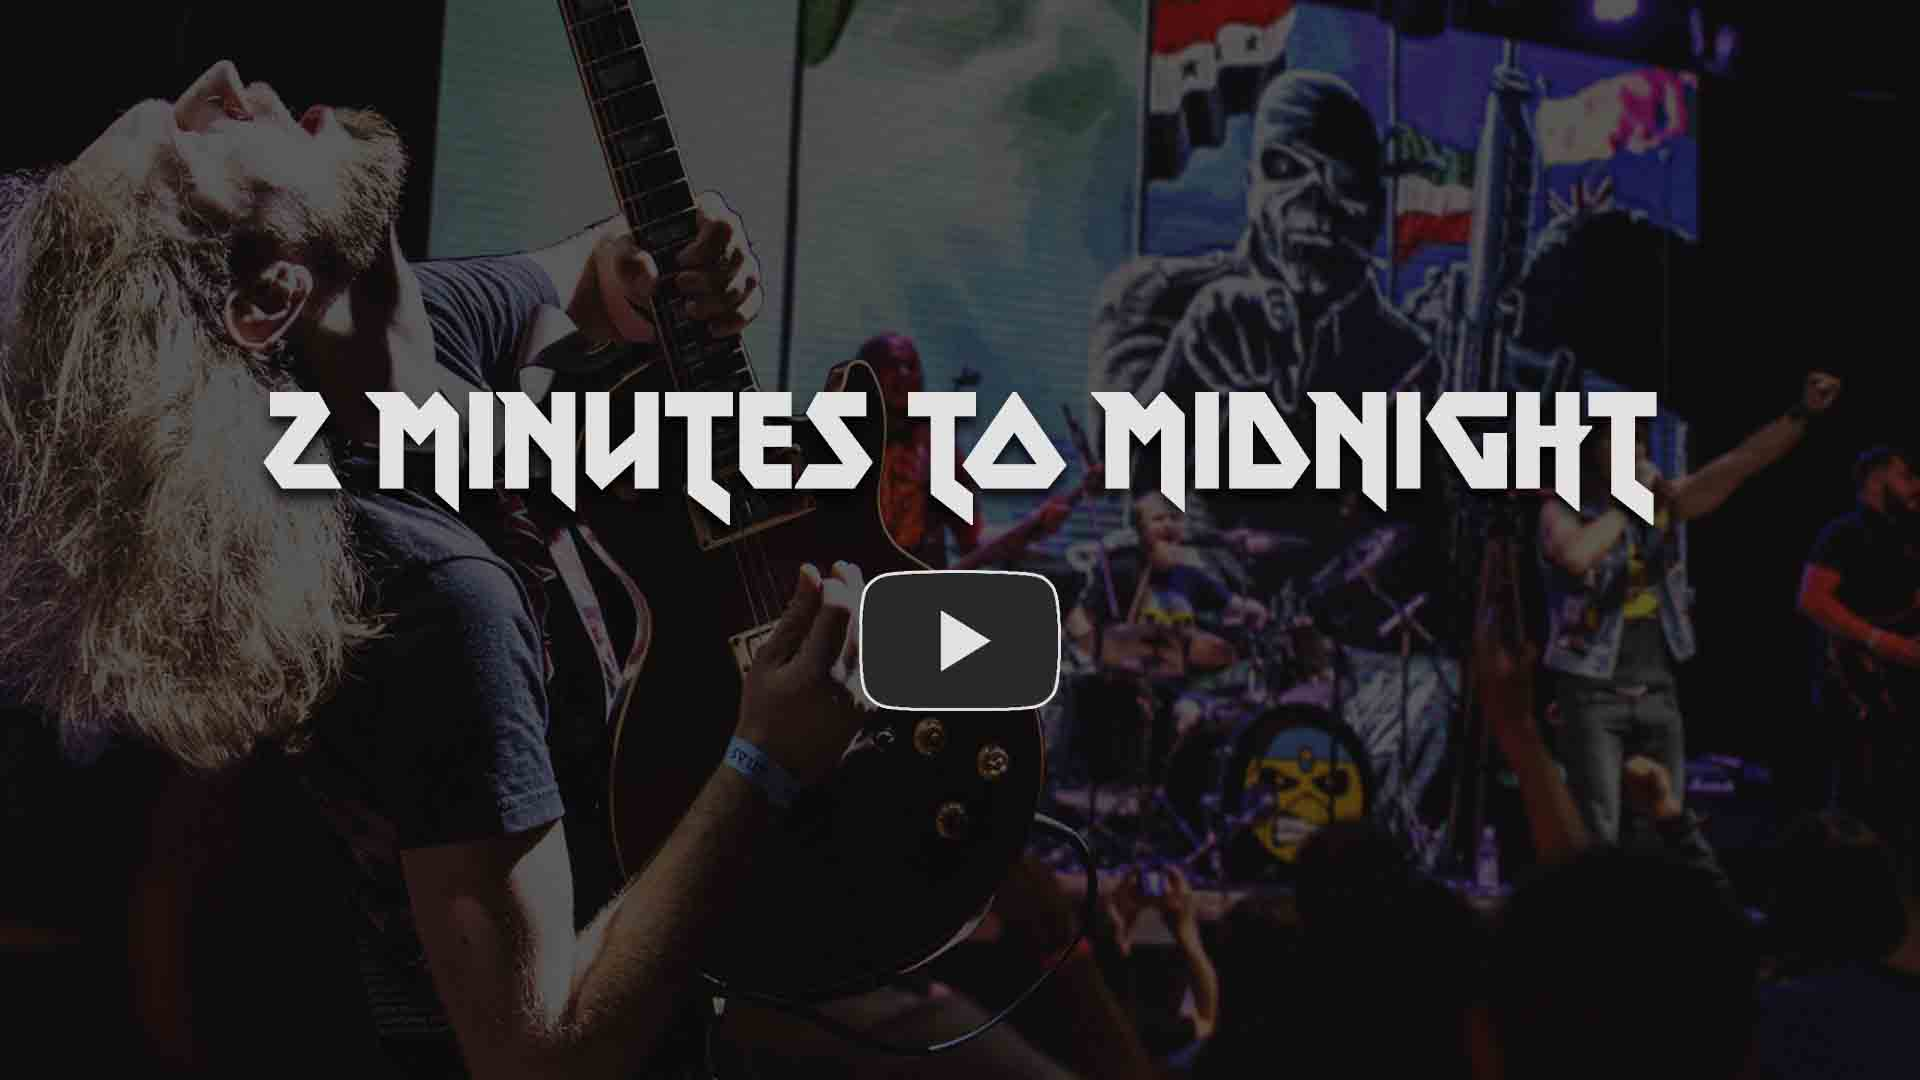 2 Minutes To Midnight